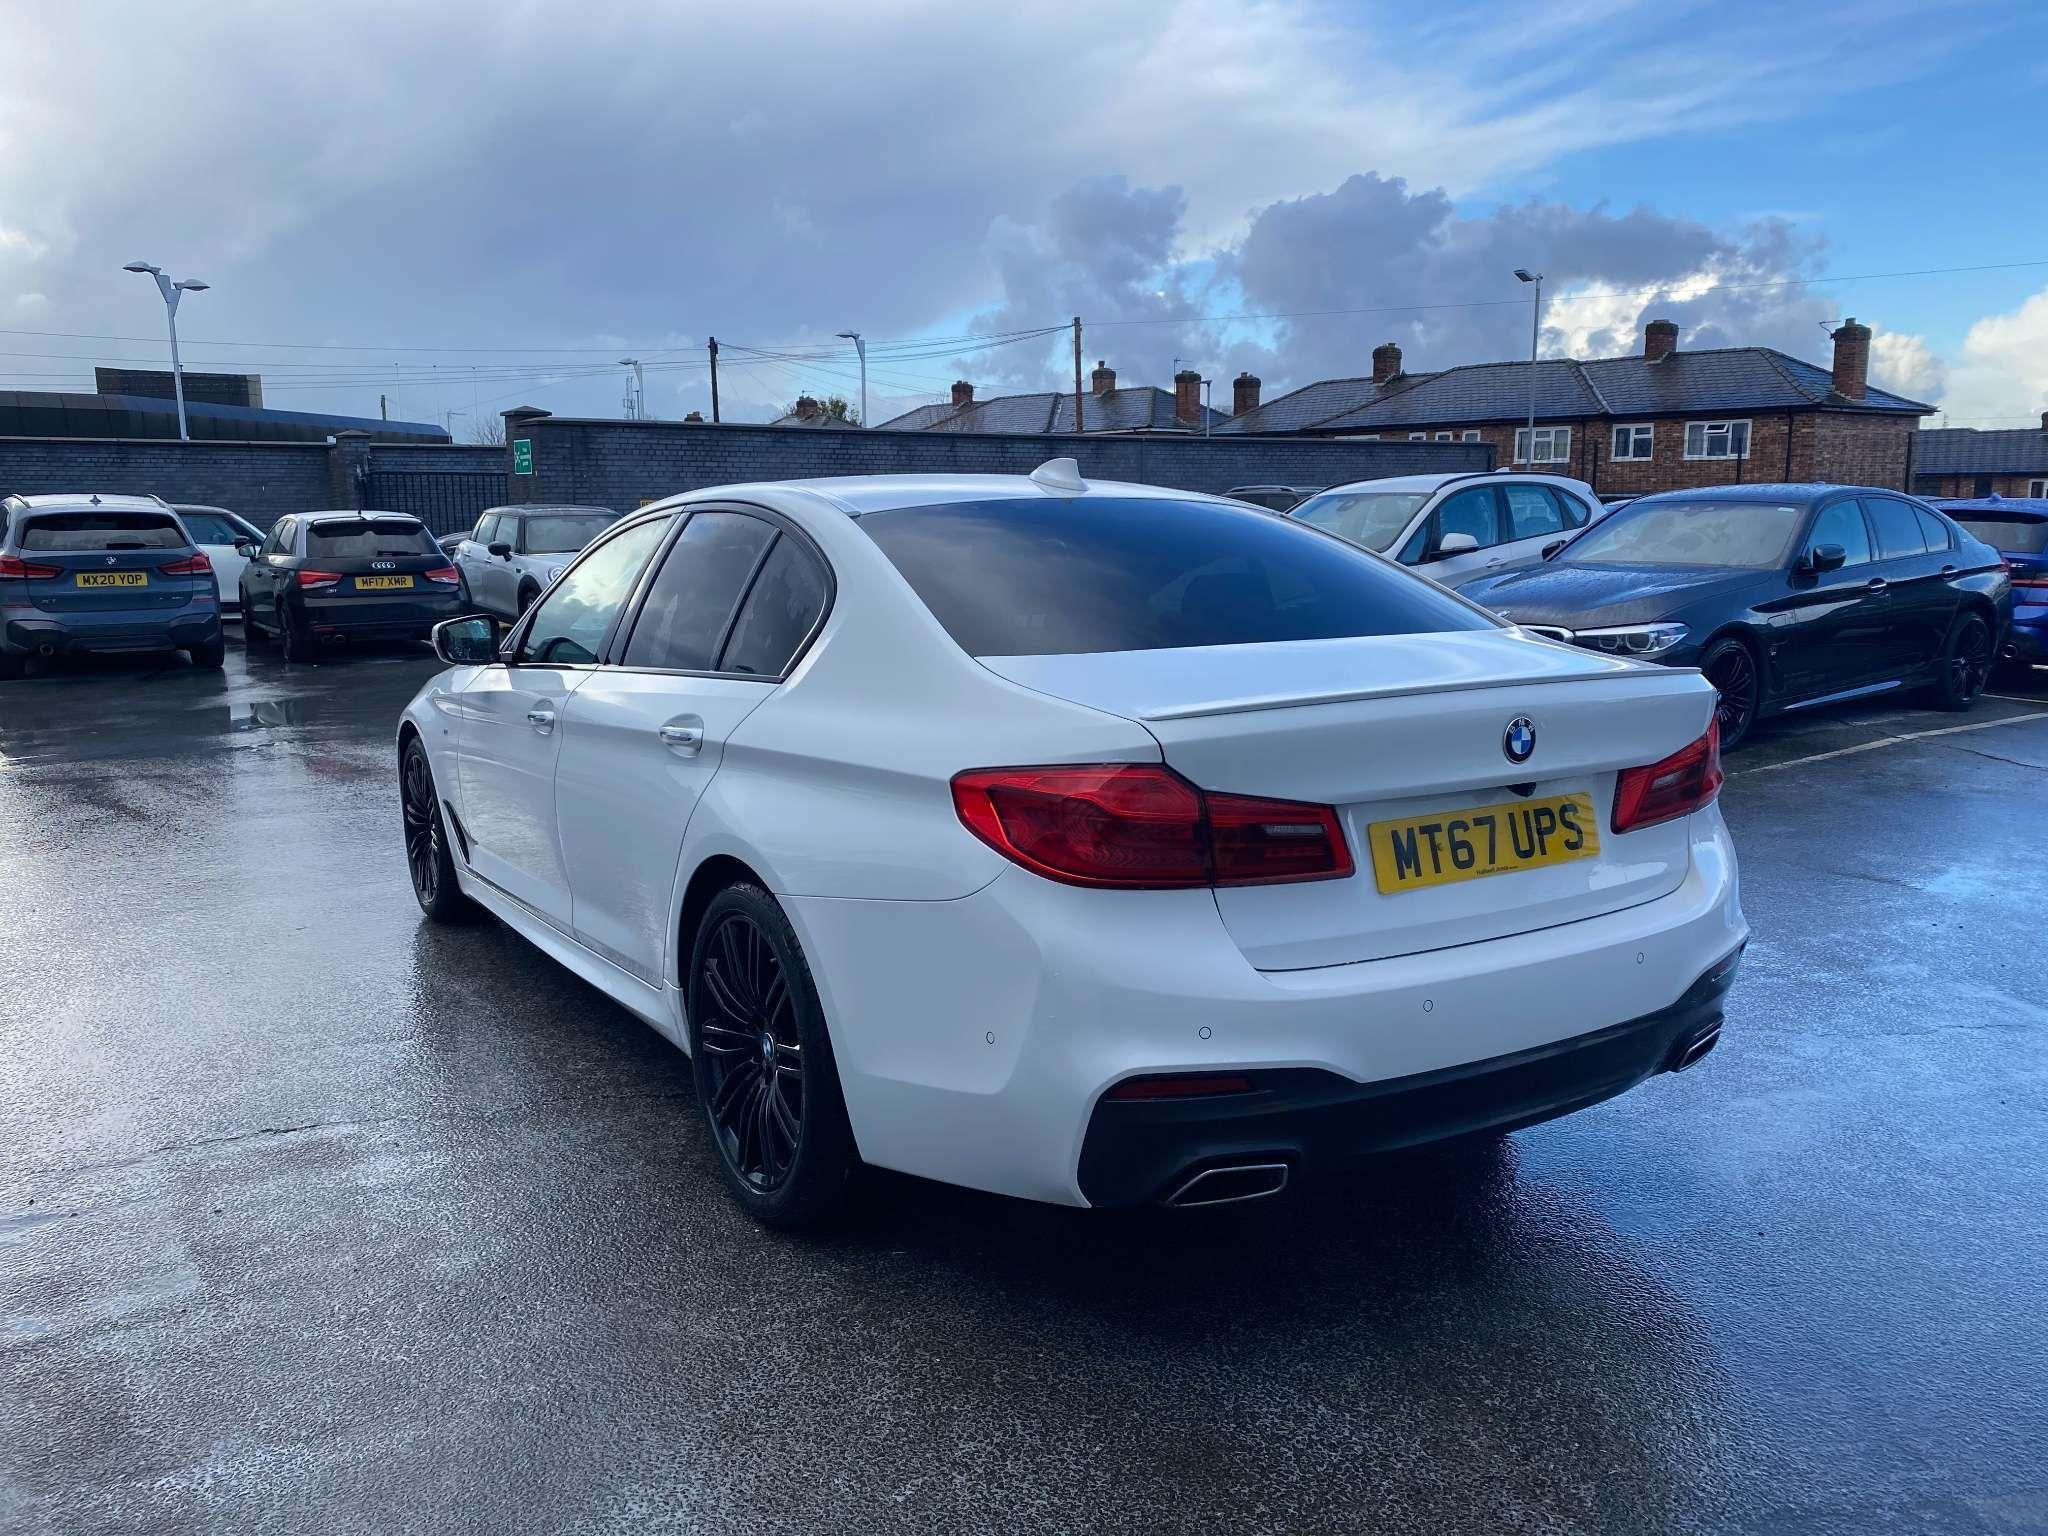 Image 2 - BMW 520d M Sport Saloon (MT67UPS)